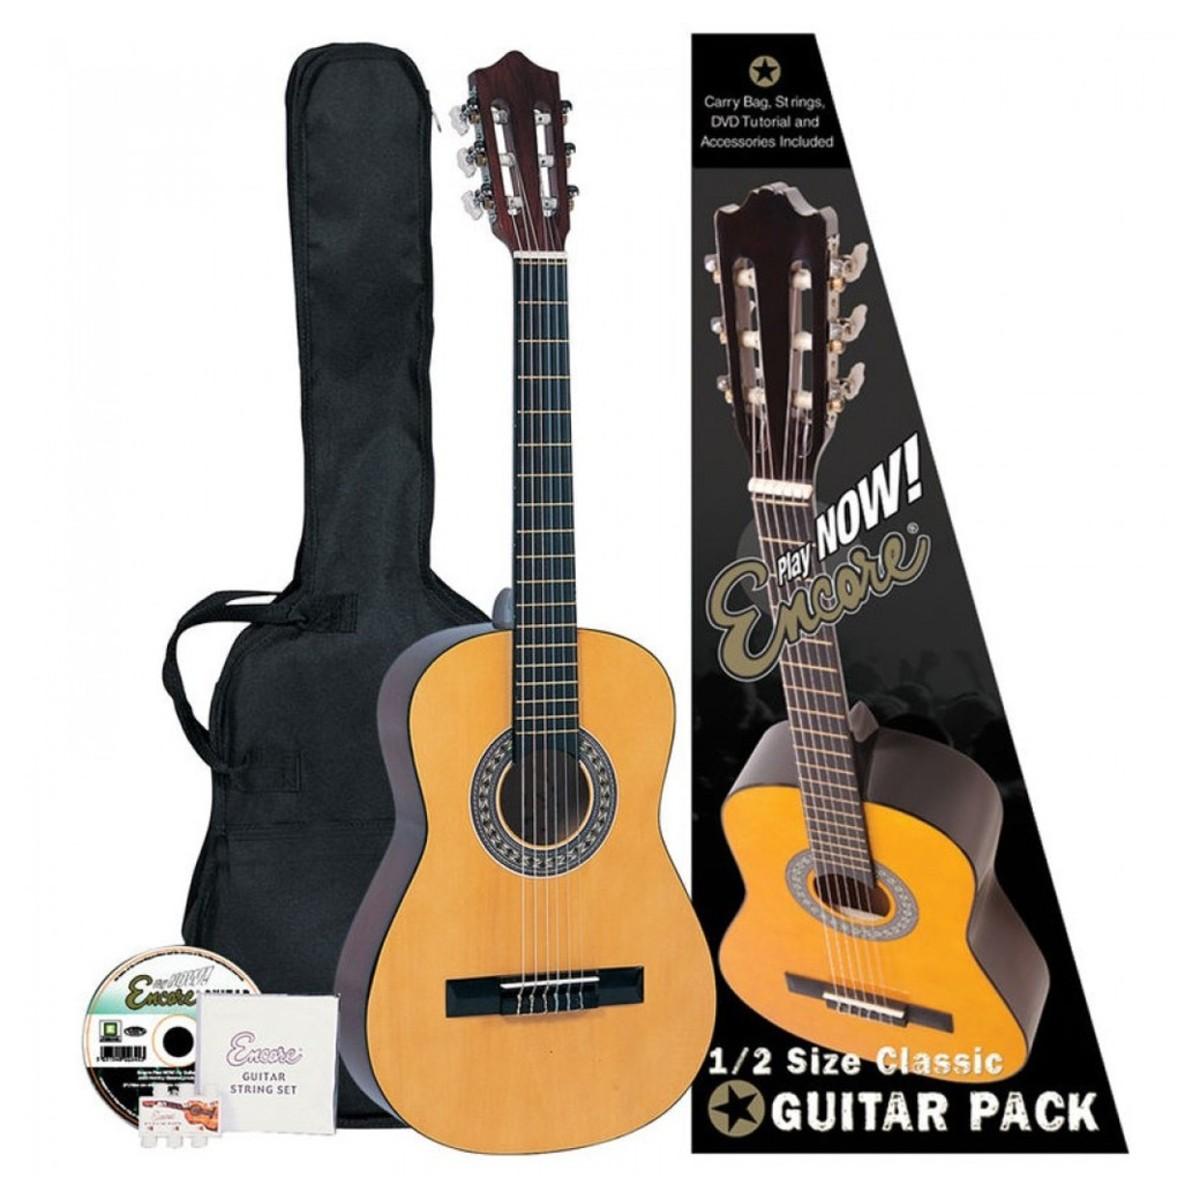 cc5a49dd75 Encore ENC120FT 1/2 size classical guitar pack inc soft case for ...